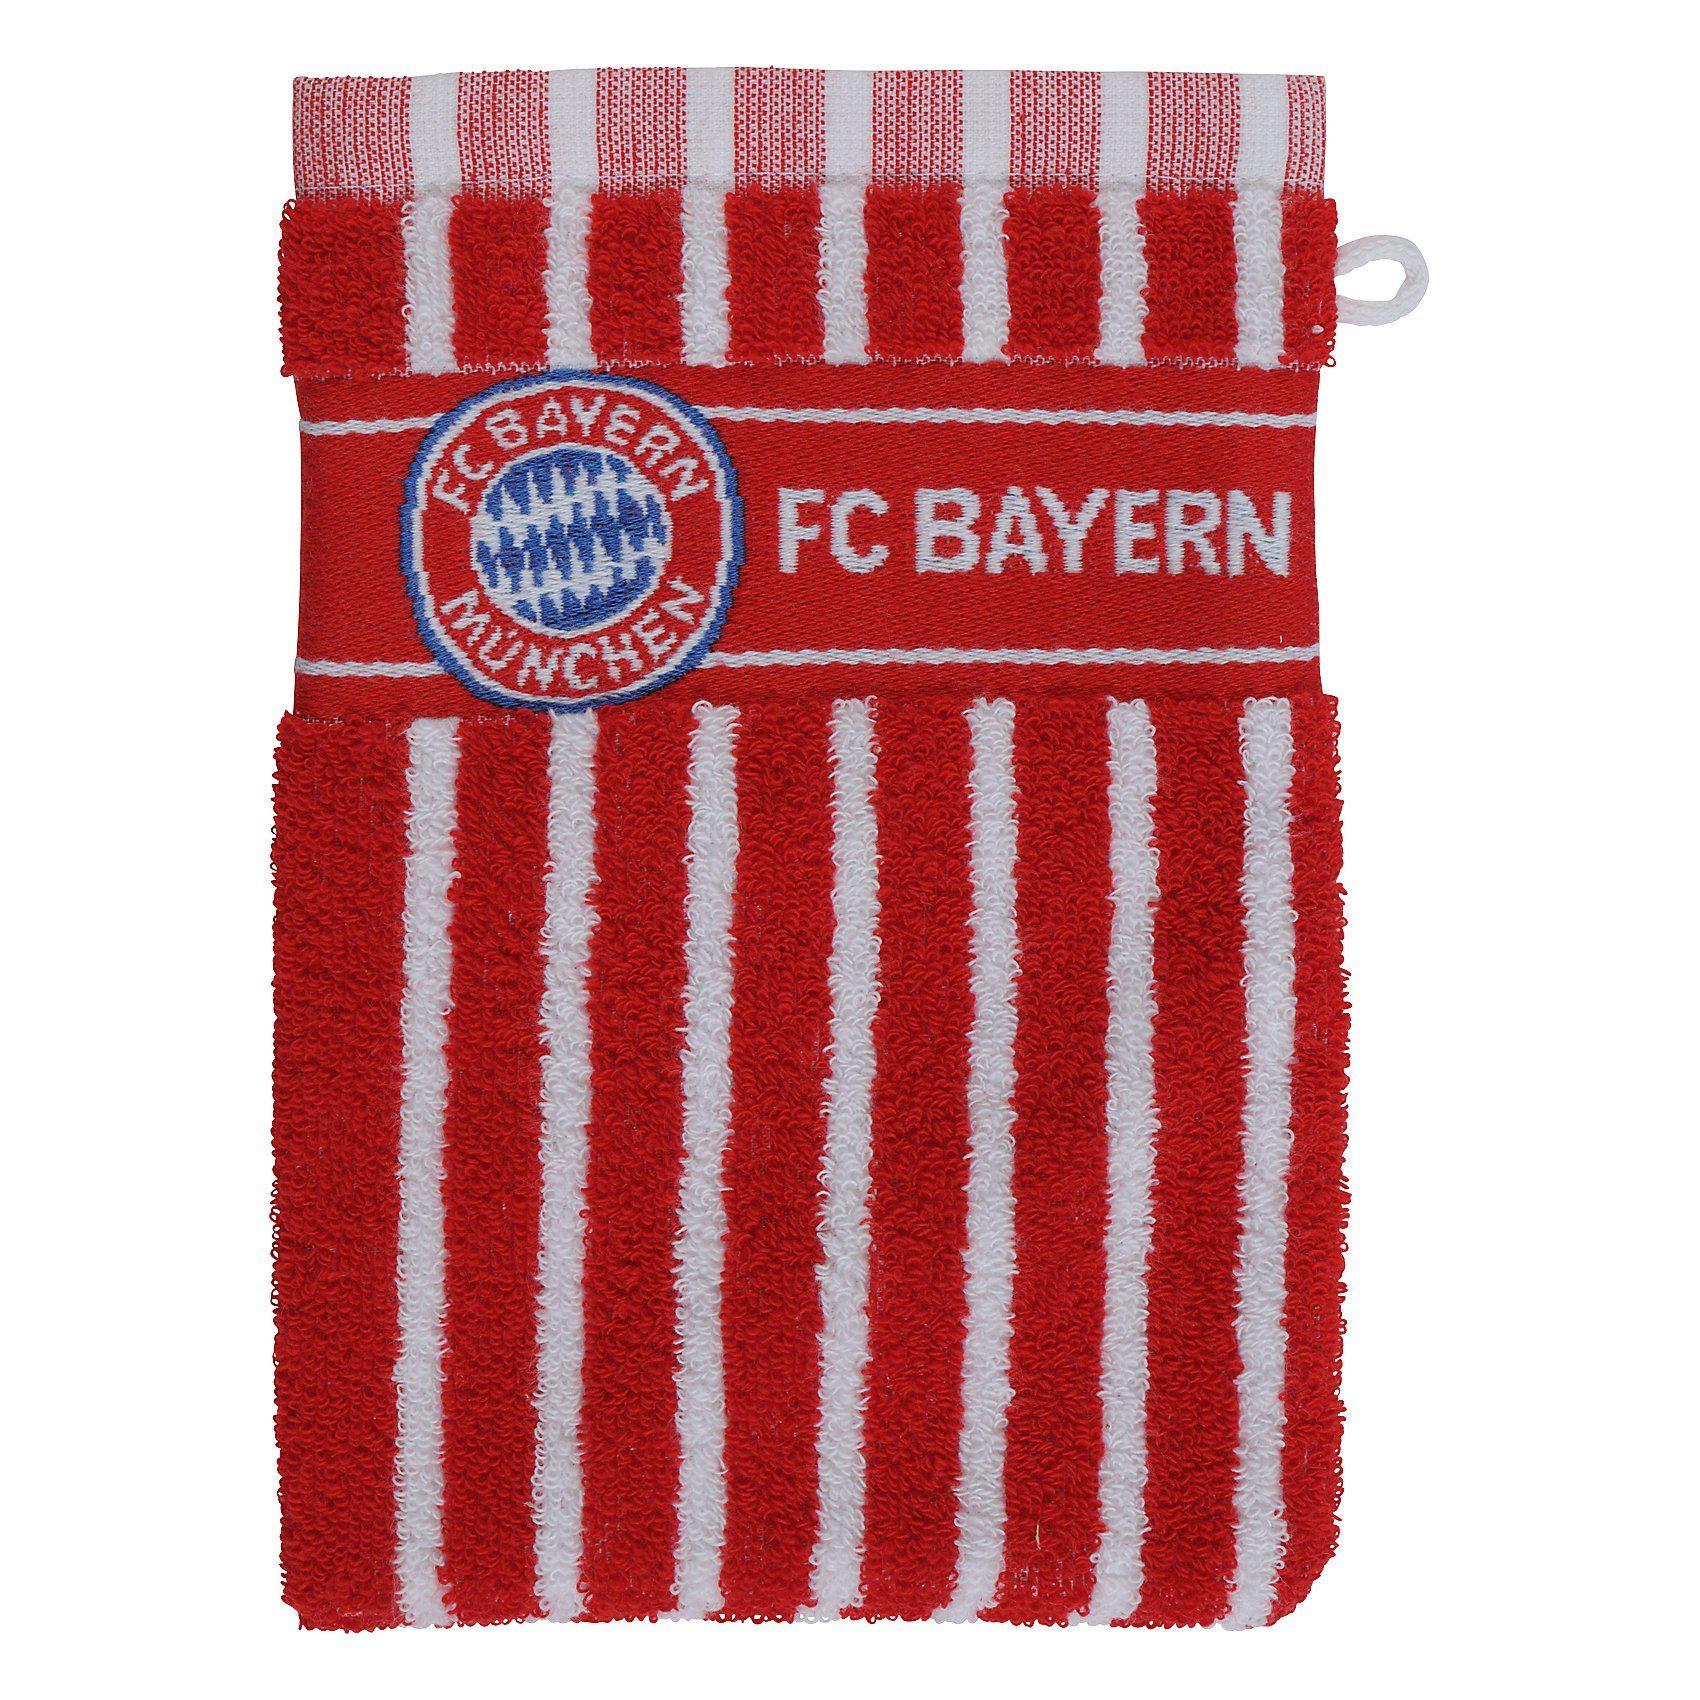 Waschhandschuh FCB, rot/weiß, 16 x 21,5 cm